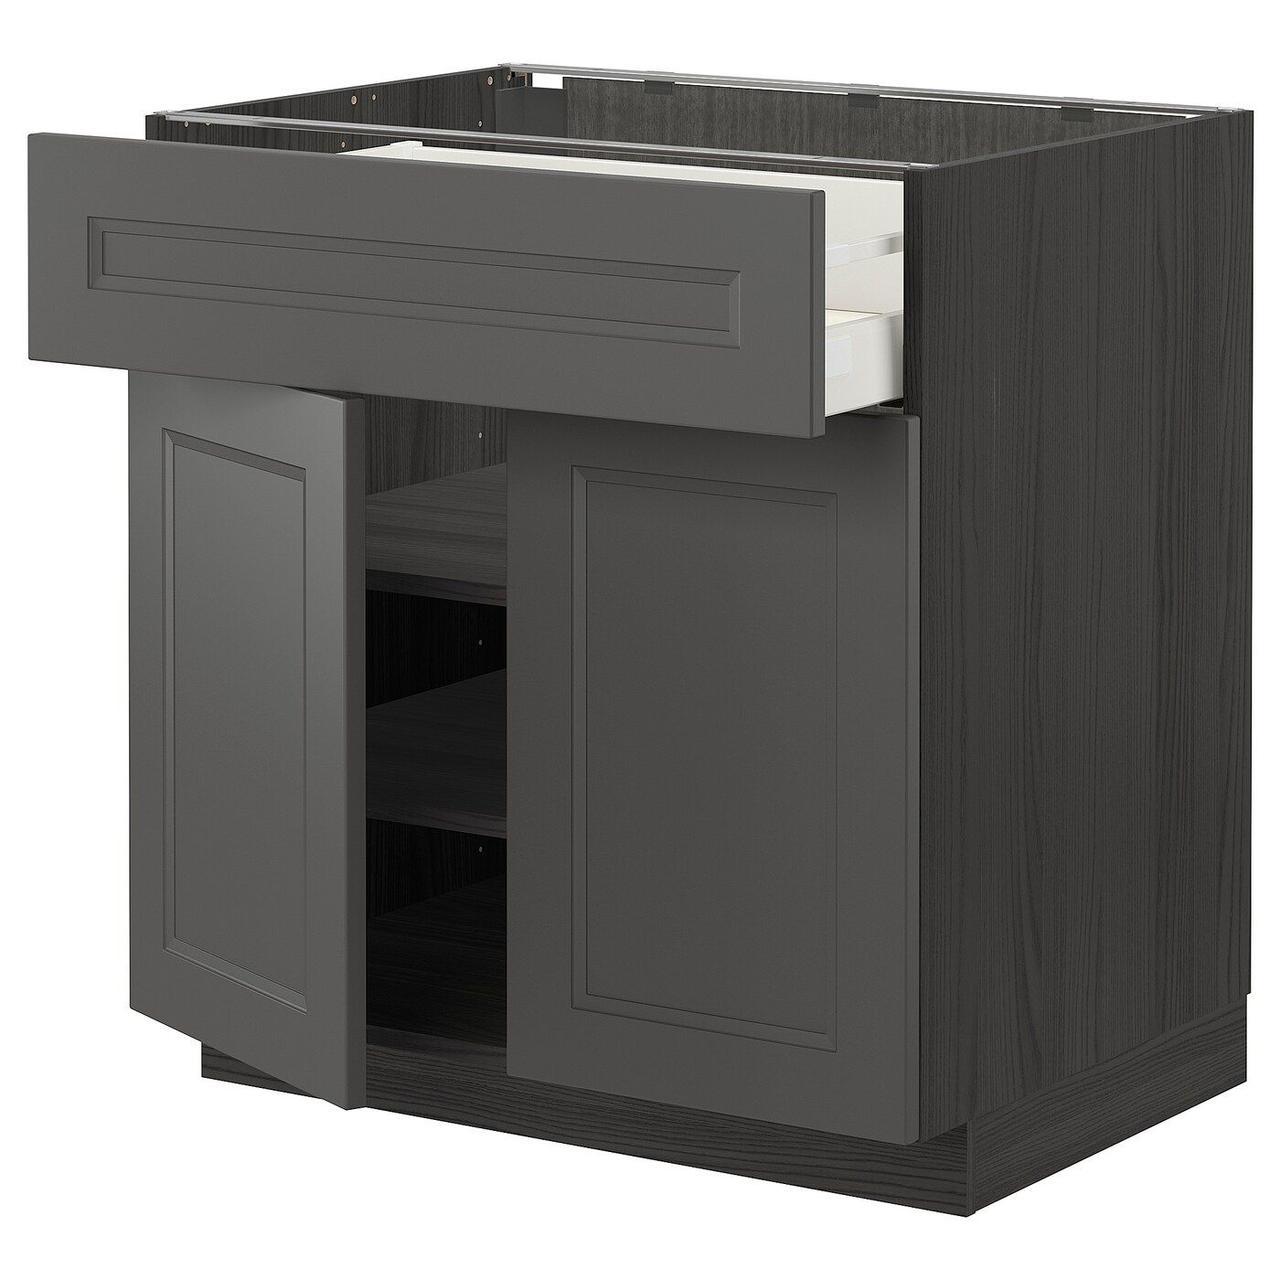 IKEA METOD / MAXIMERA (ІКЕА МЕТОДИ / MAXIMERA) 29322873